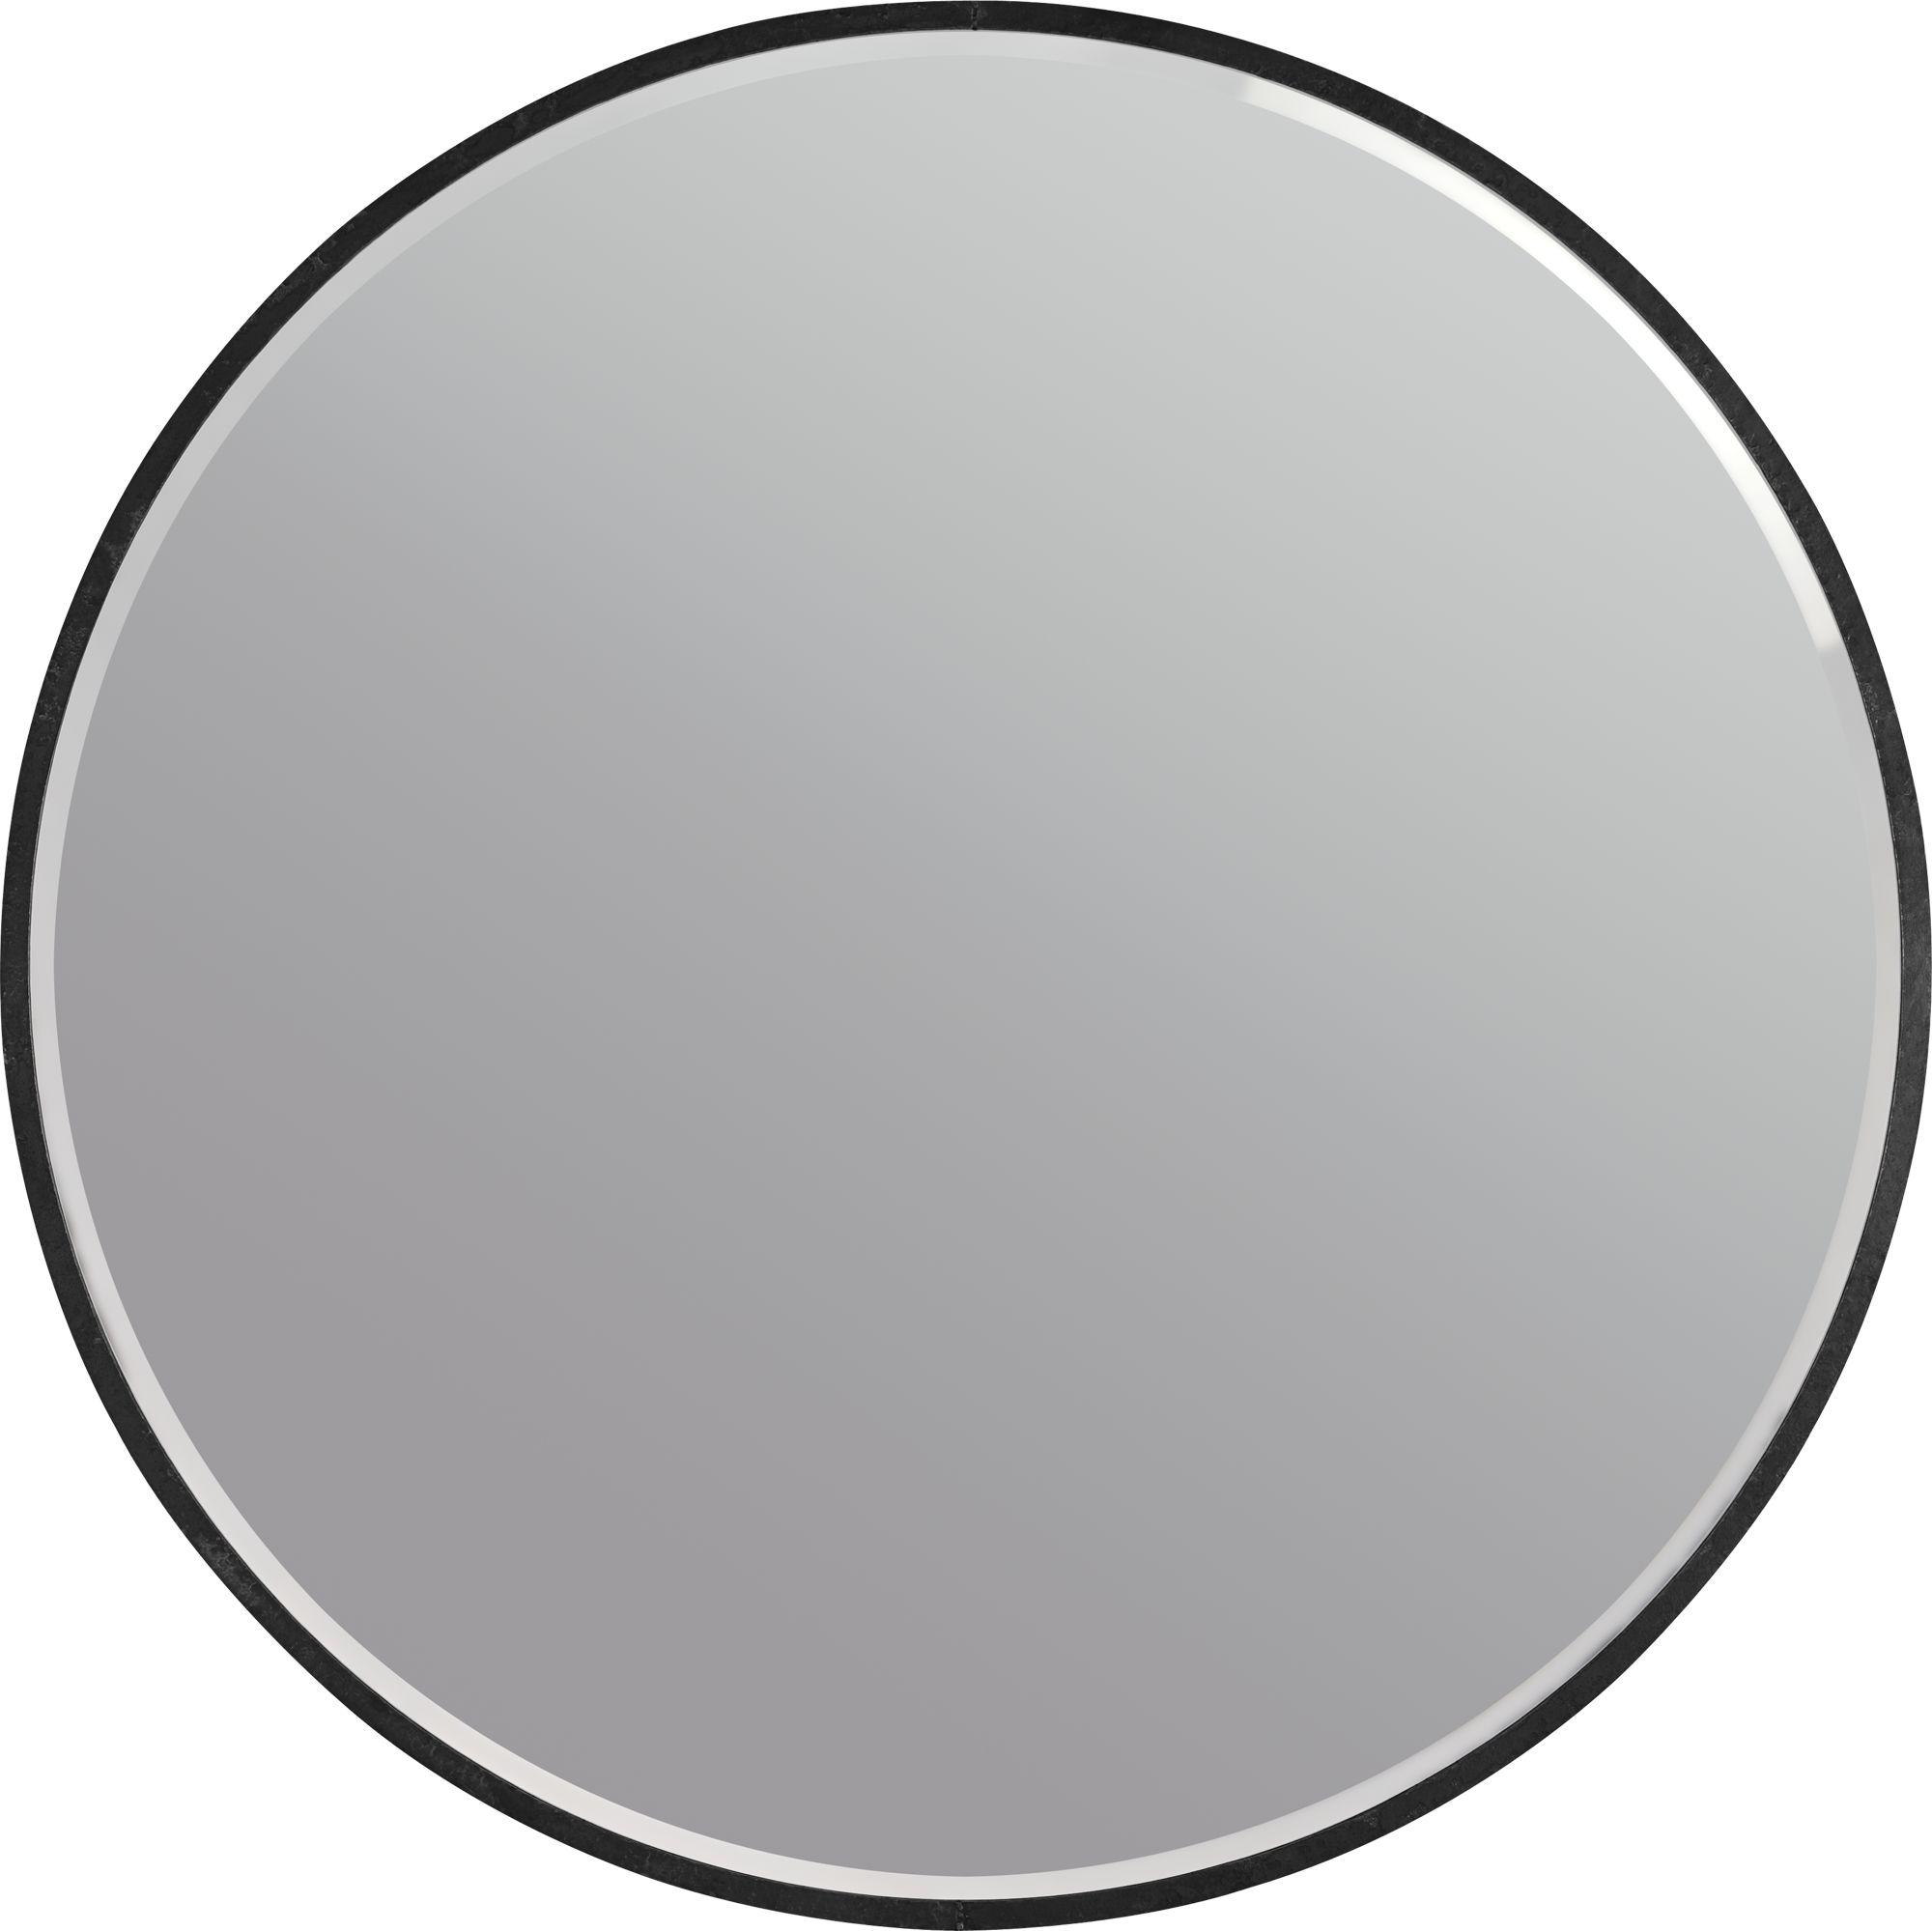 https://s7d4.scene7.com/is/image/KIG/B2_aab58431?scl=1